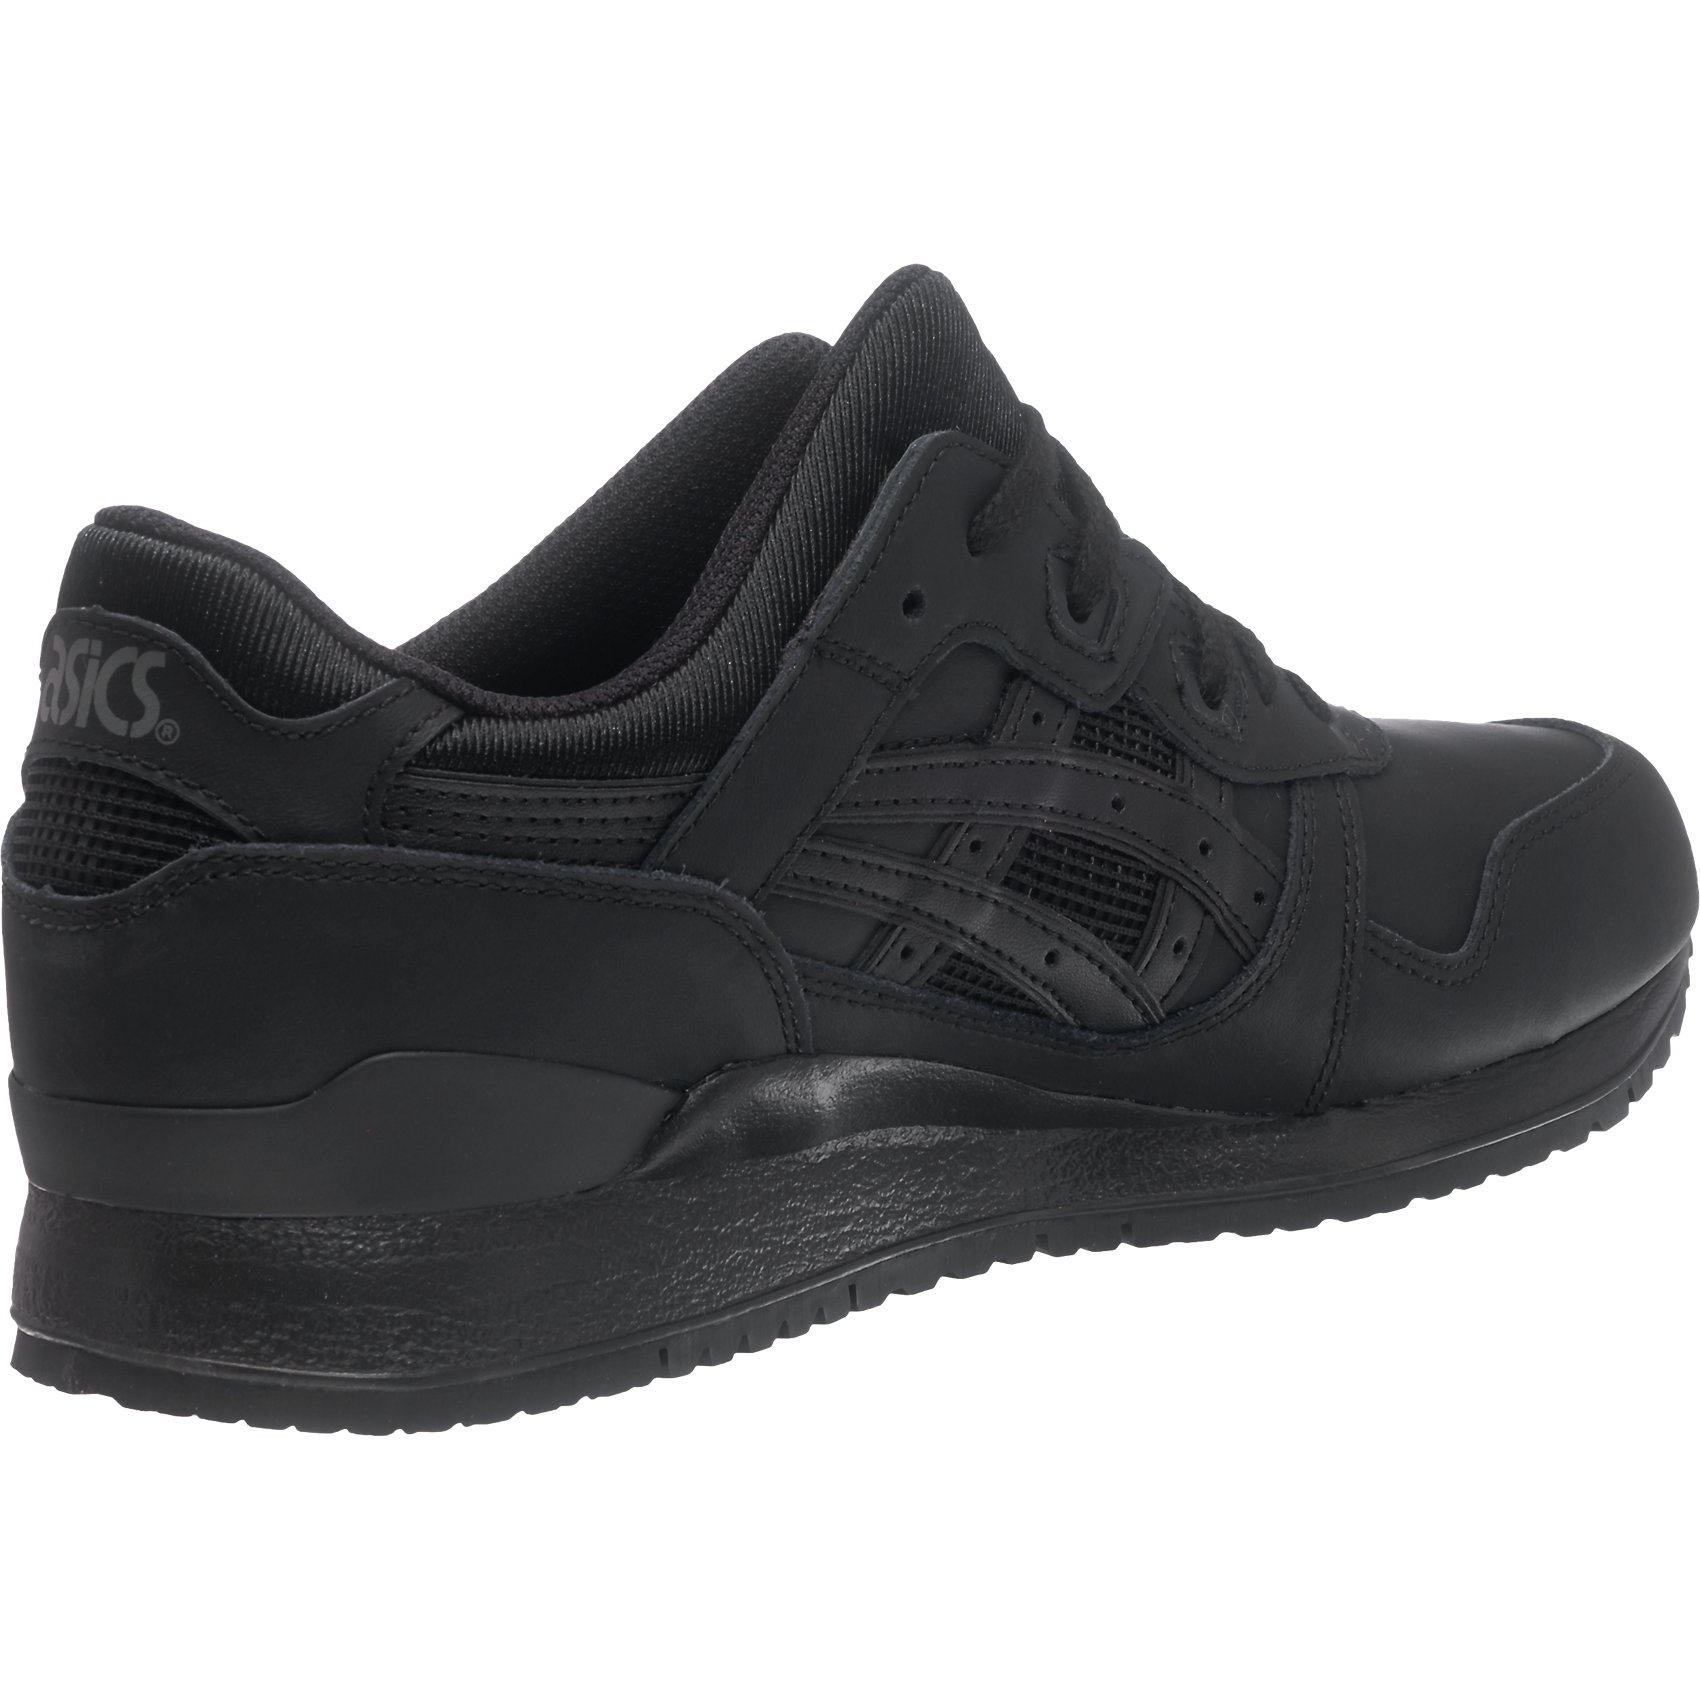 Neu Asics Tiger Gel Lyte Iii Sneakers Schwarz 6924939 Ebay